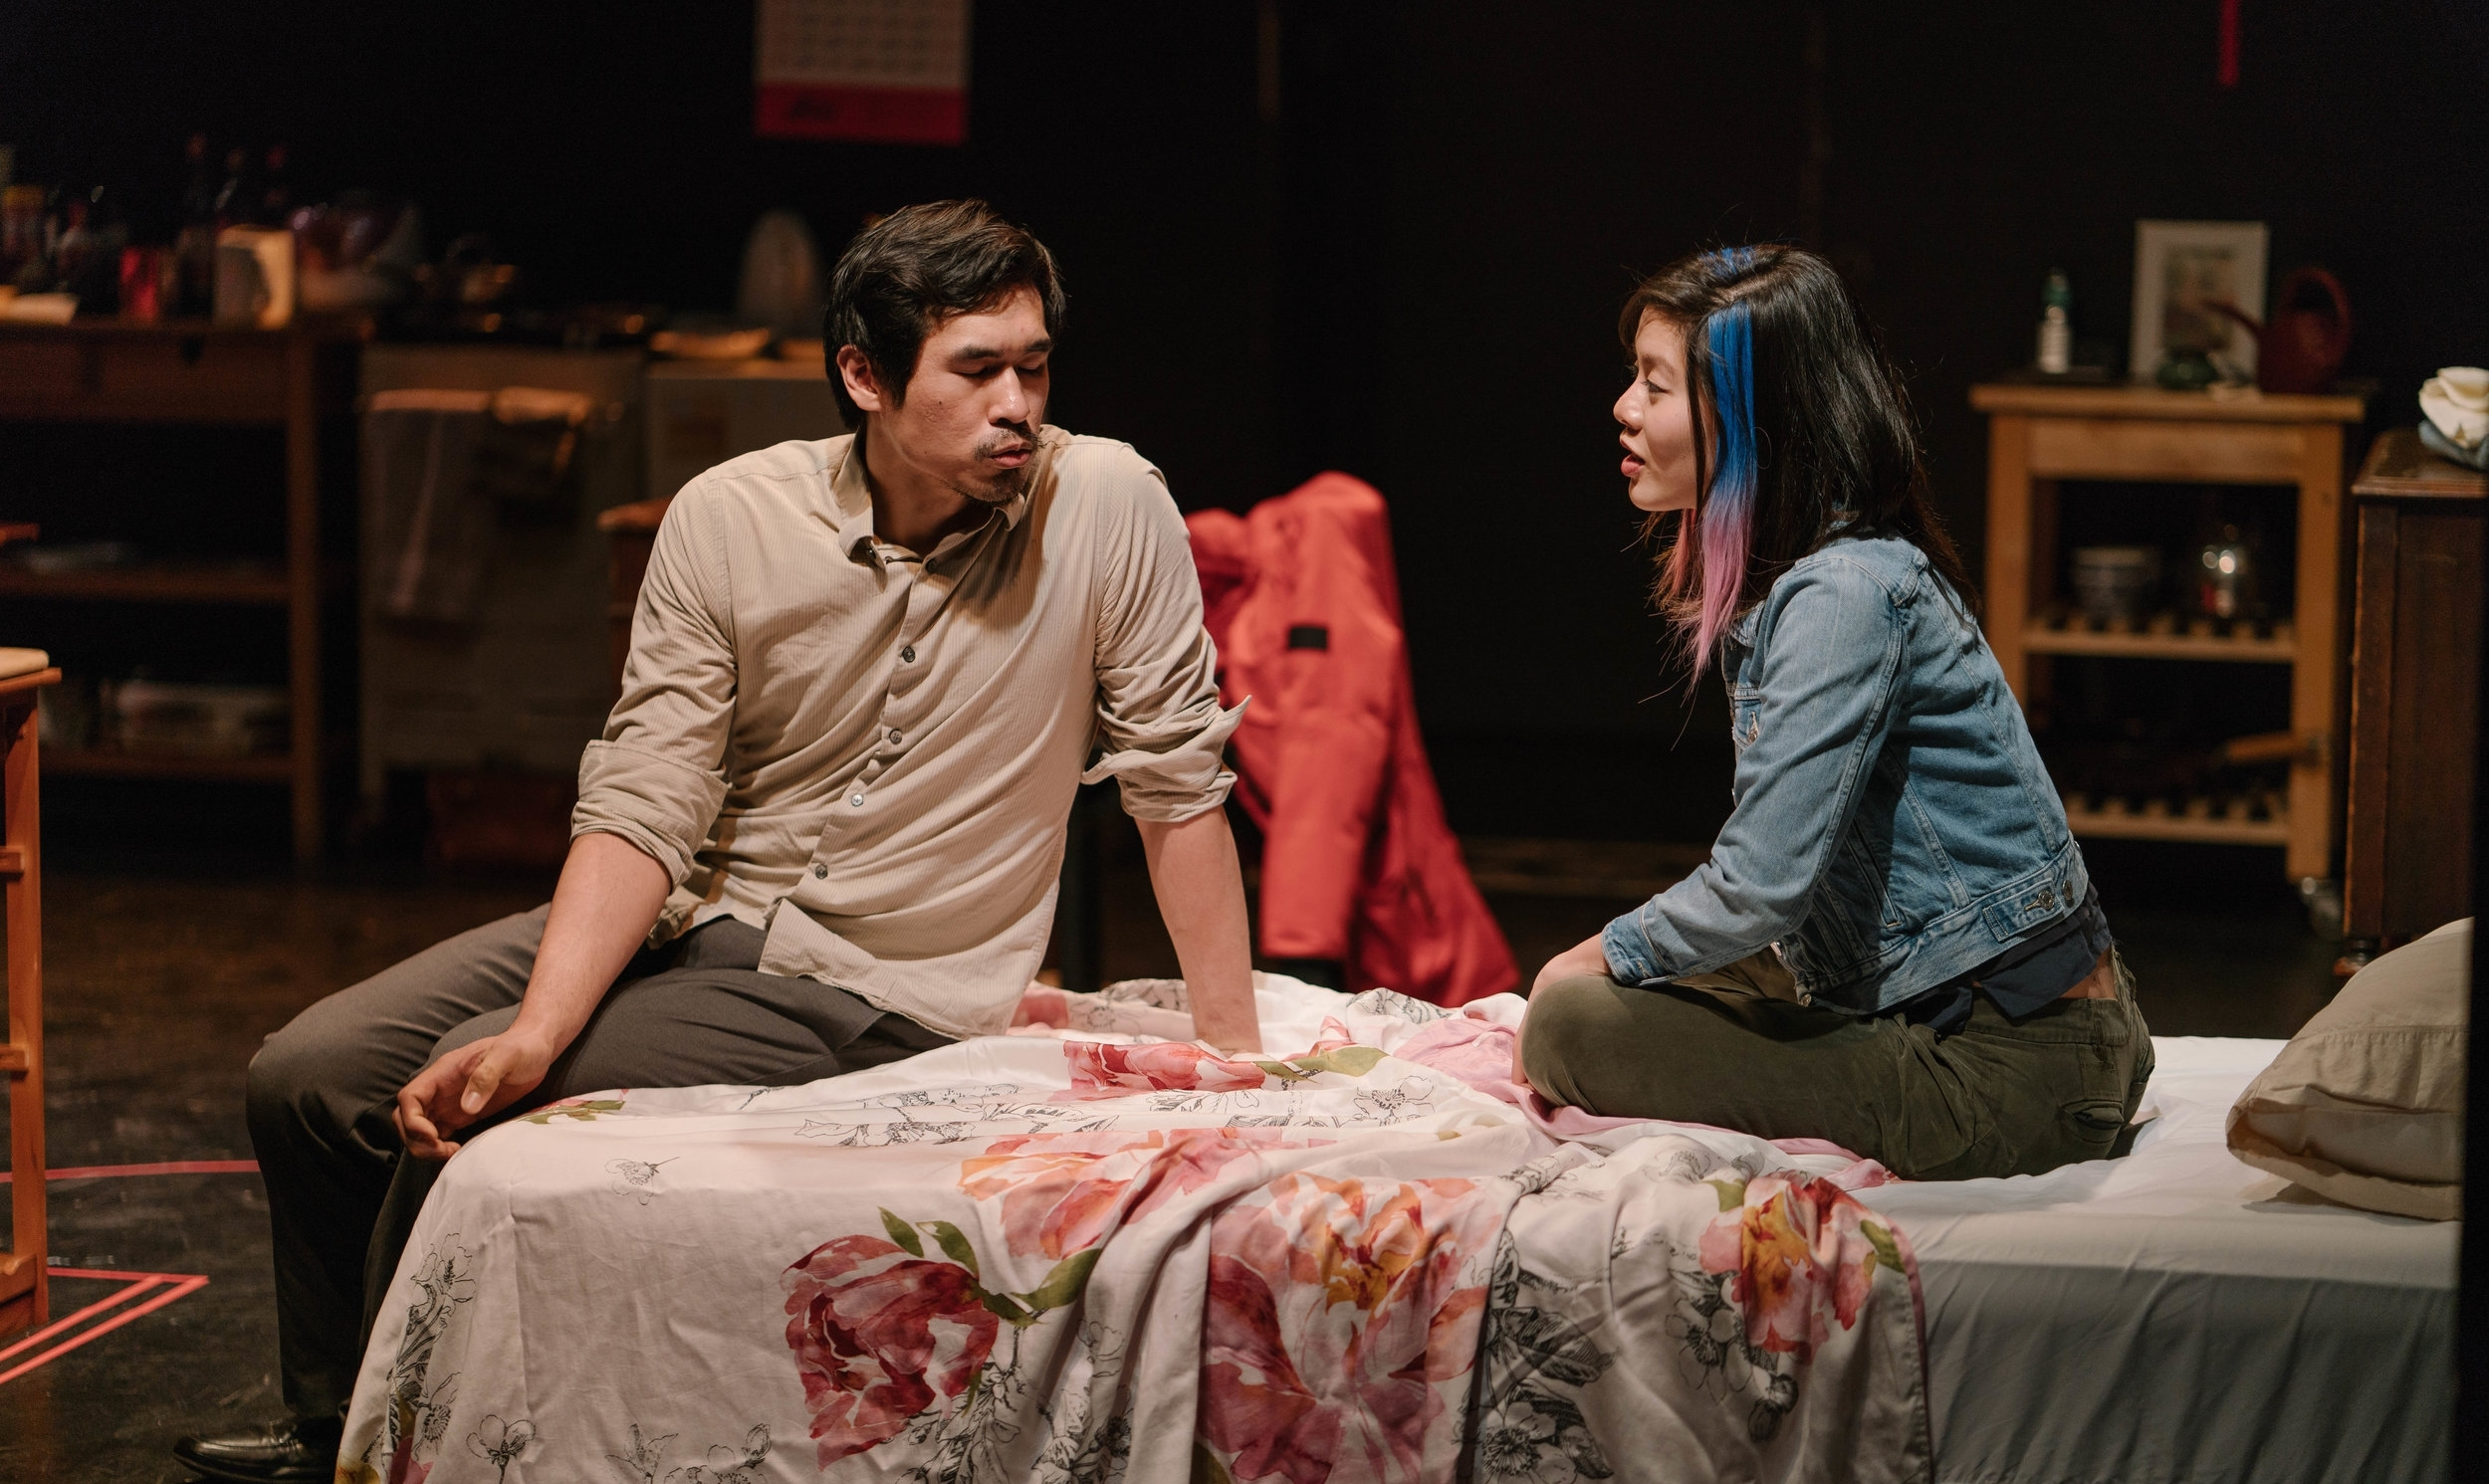 Al Patrick Jo as Tang Meng/Dan and Stefani Kuo as Abby. Photo by Elvin Hu.